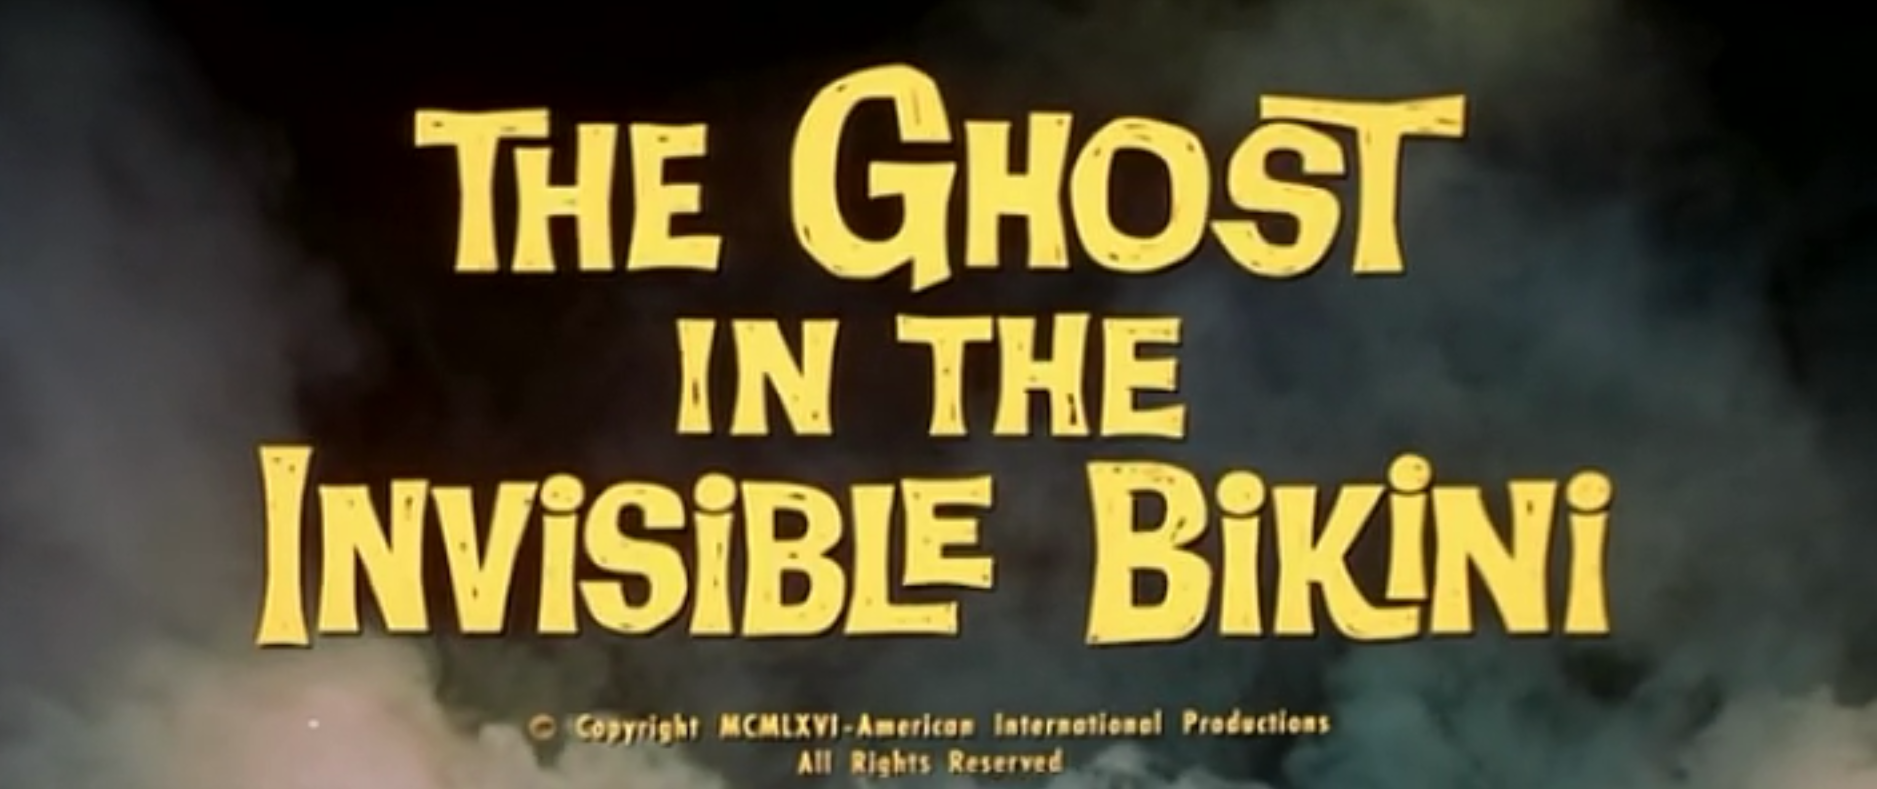 GhostInTheInvisibleBikini1